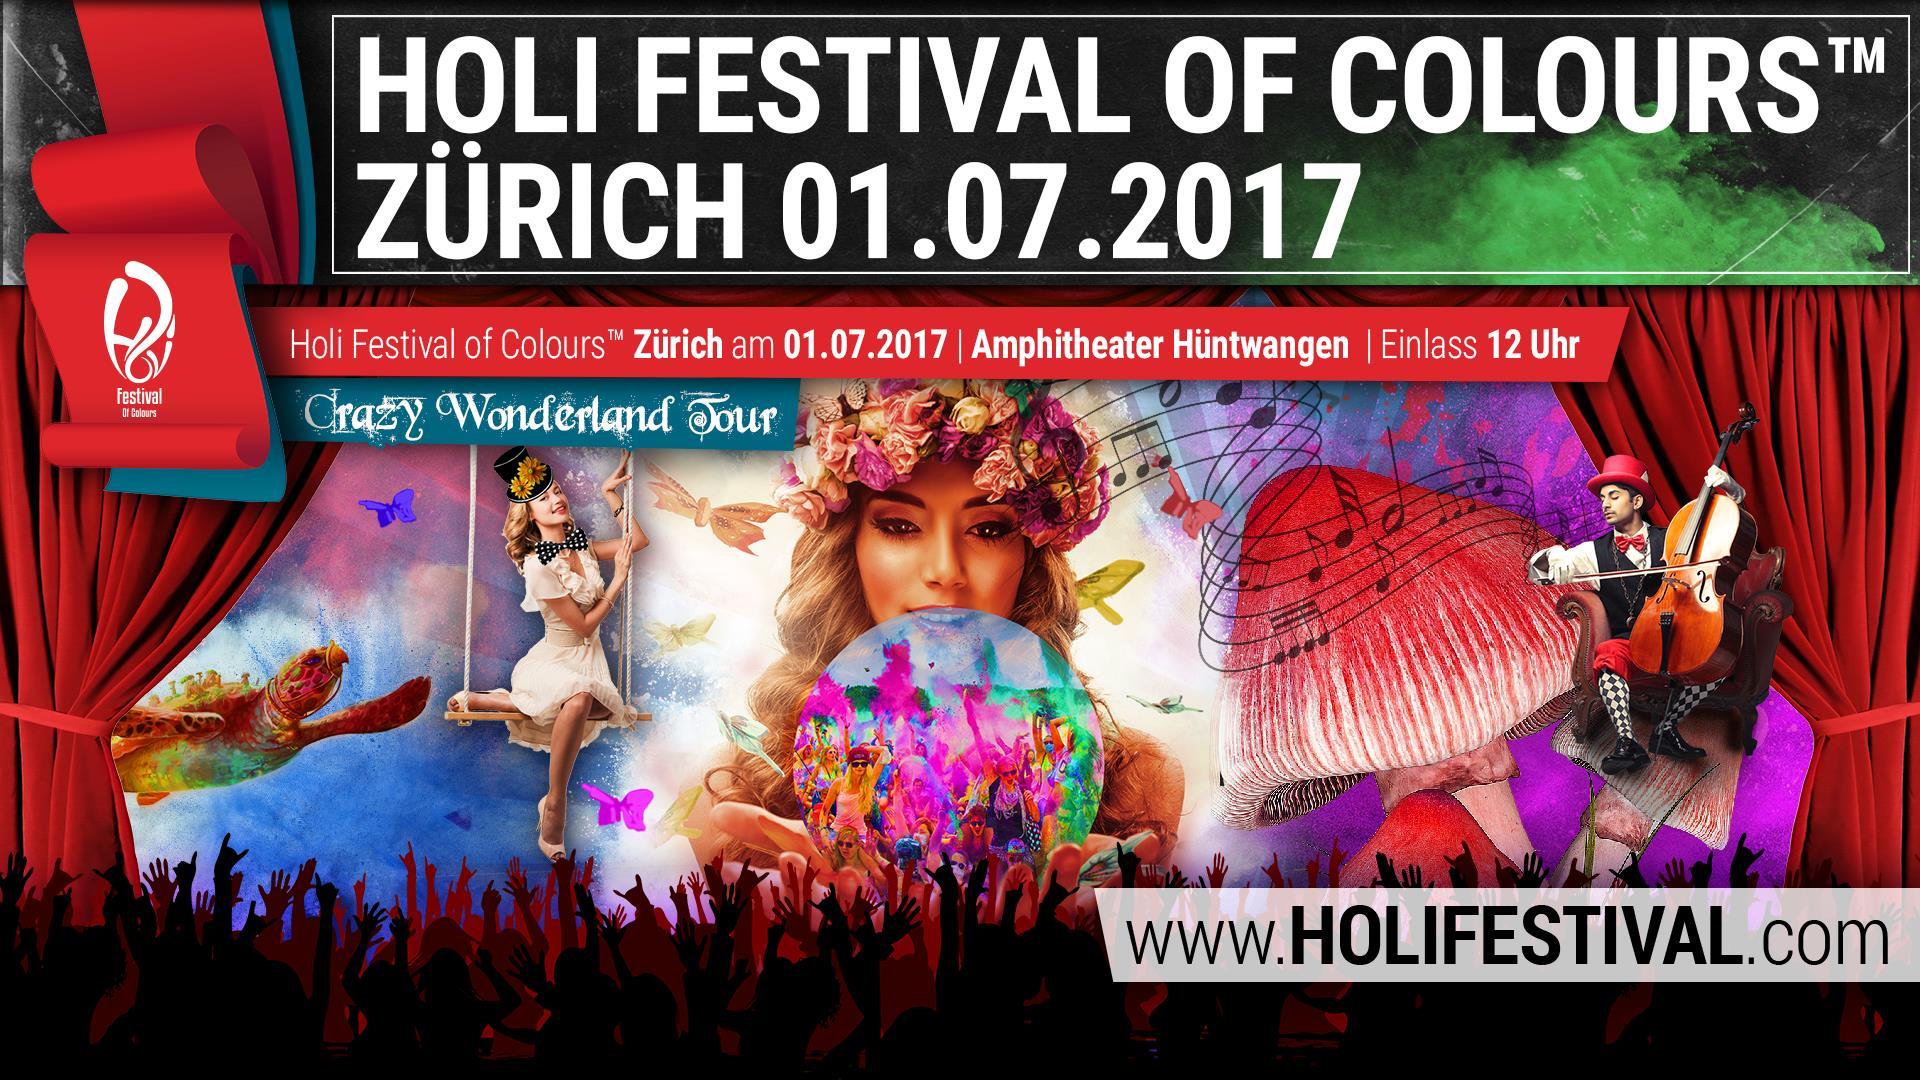 Das bunte Holi Festival kehrt zurück